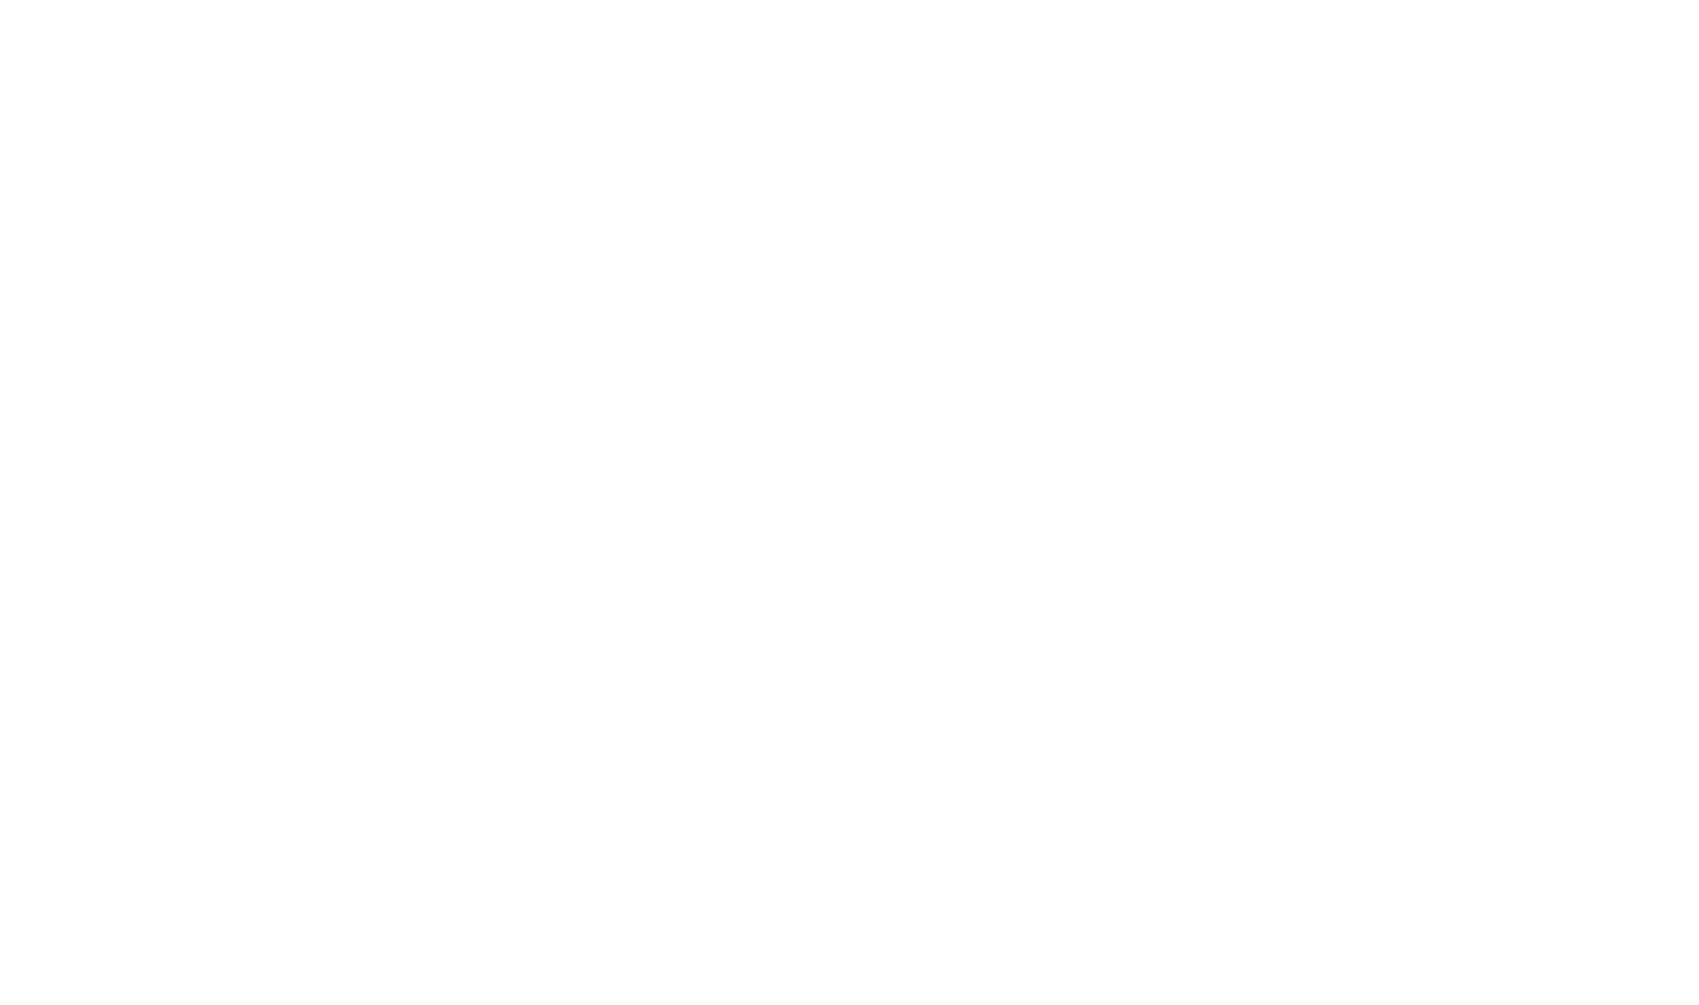 www.erivefilms.com